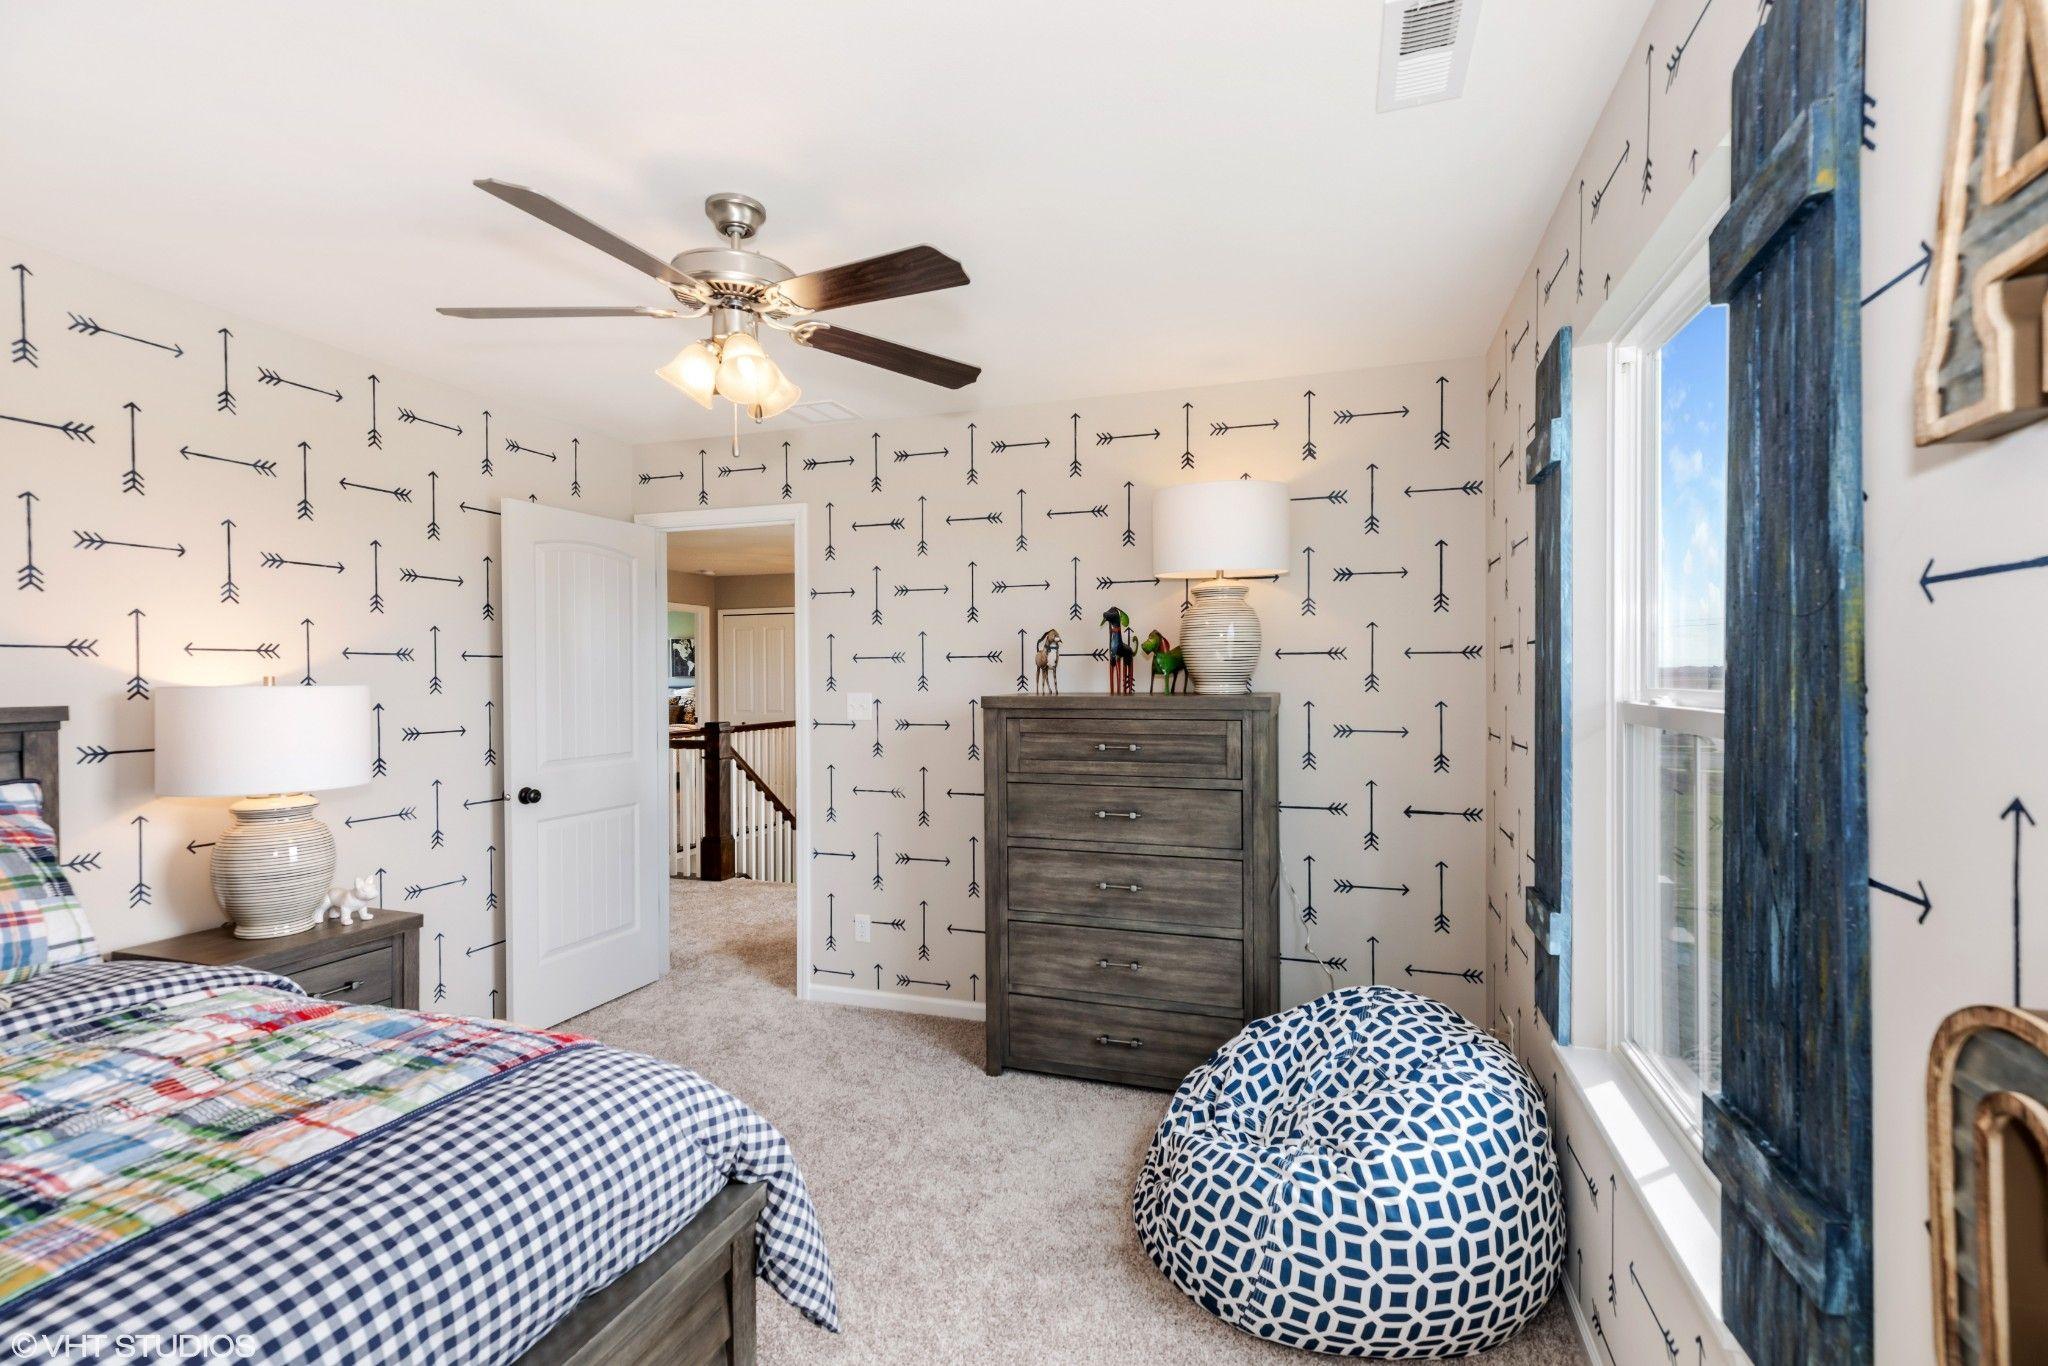 Bedroom featured in the Berkley By Olthof Homes in Fort Wayne, IN